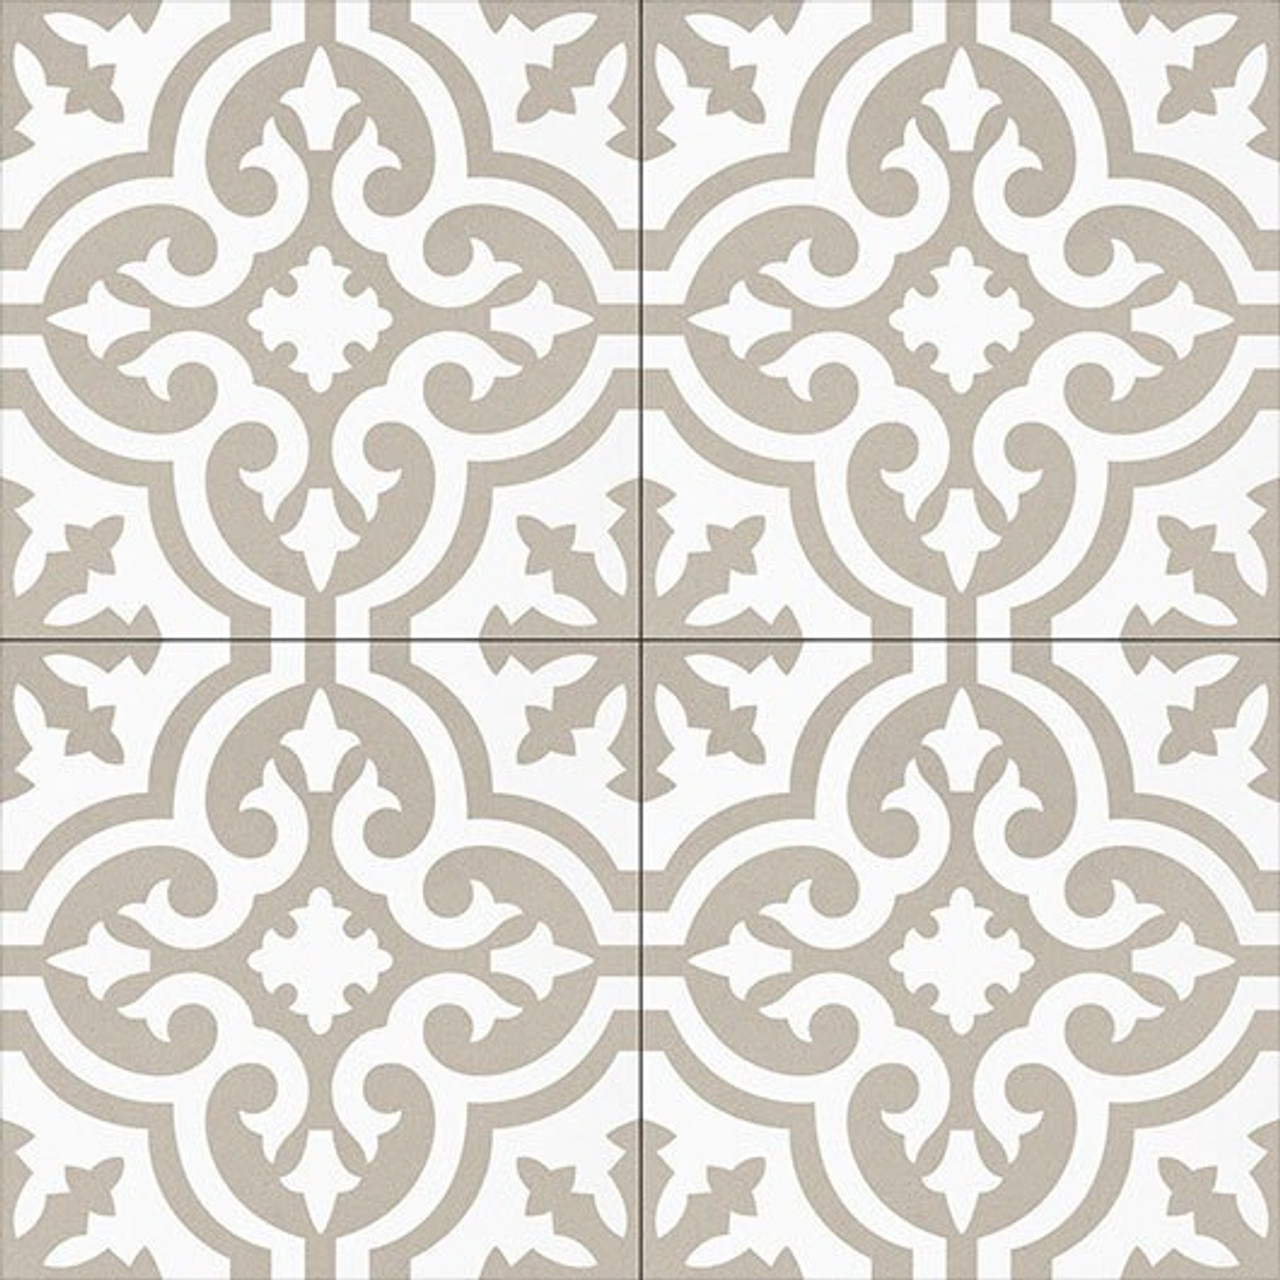 Bella Glass Tiles Amalfi Coast Porcelain Tile Organza Antique